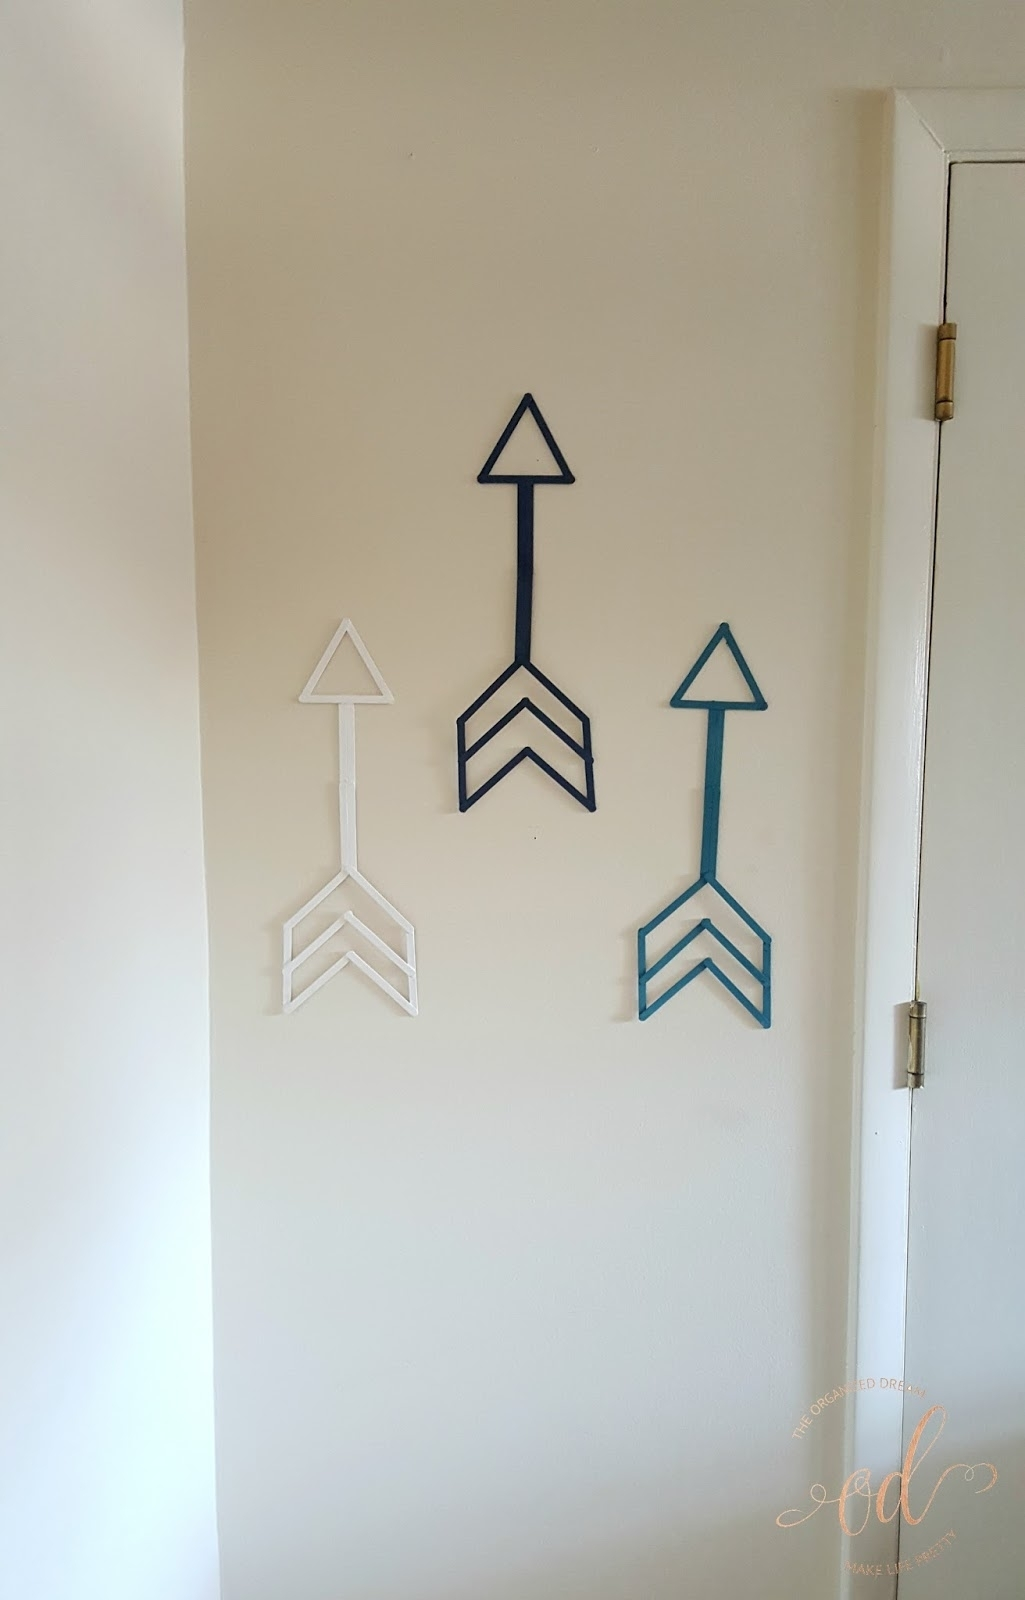 Diy Arrow Wall Art – The Organized Dream In Latest Arrow Wall Art (View 7 of 20)